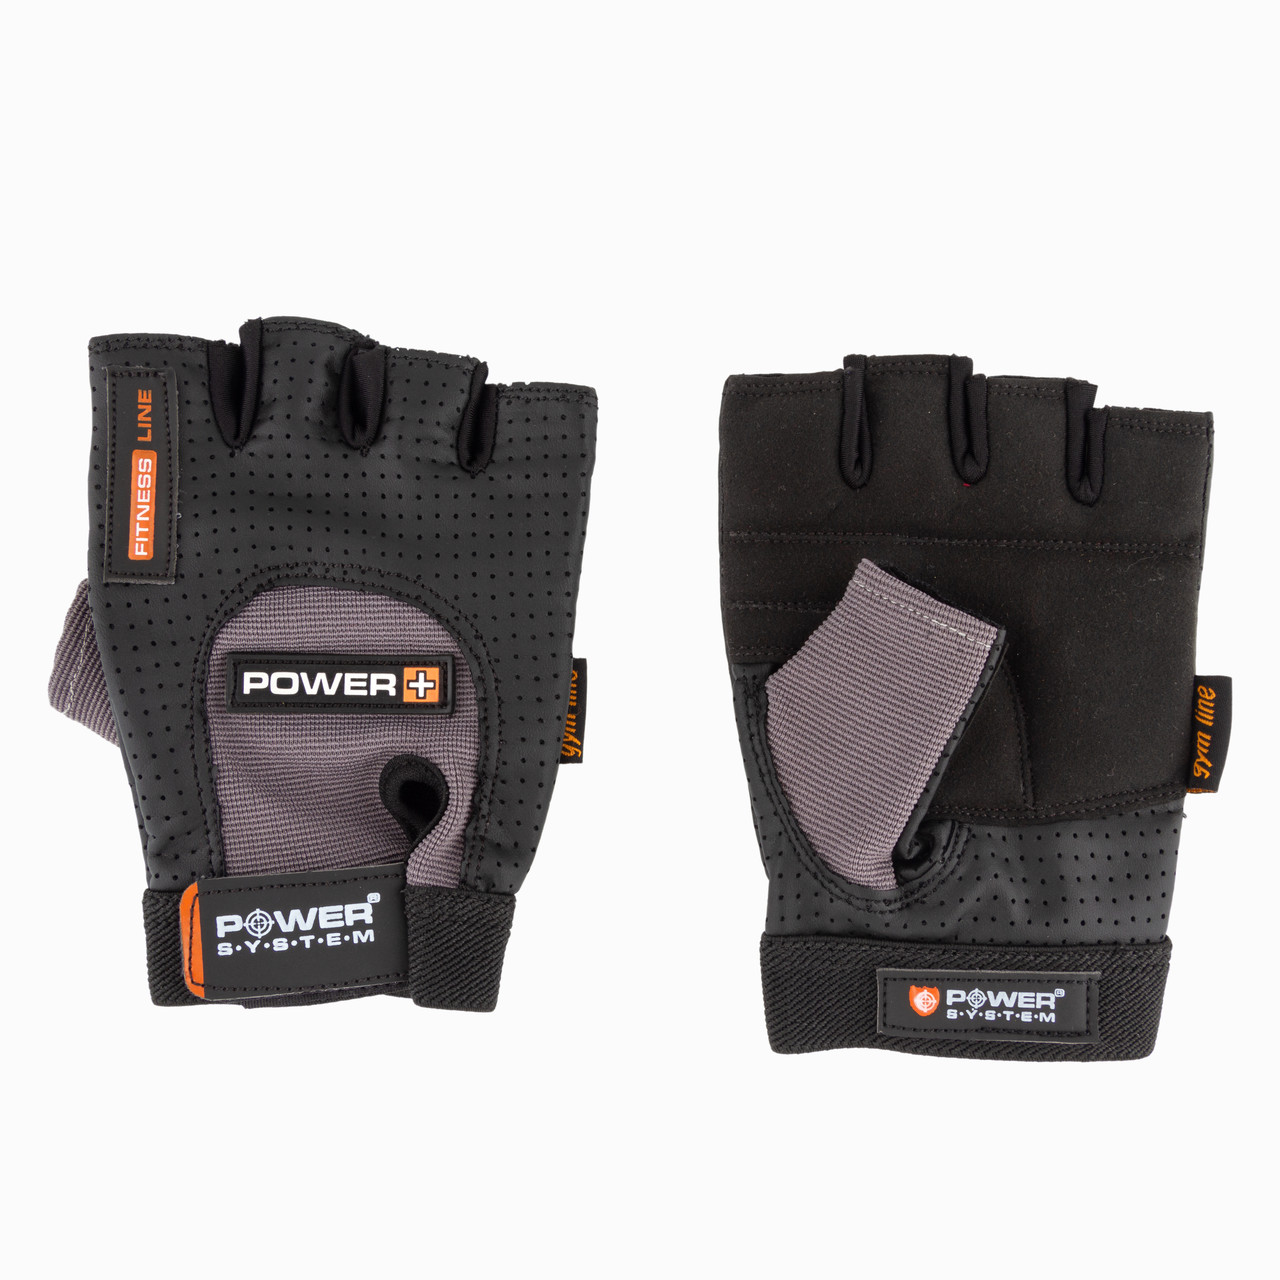 Перчатки для фитнеса и тяжелой атлетики Power System Power Plus PS-2500 XS Black/Grey